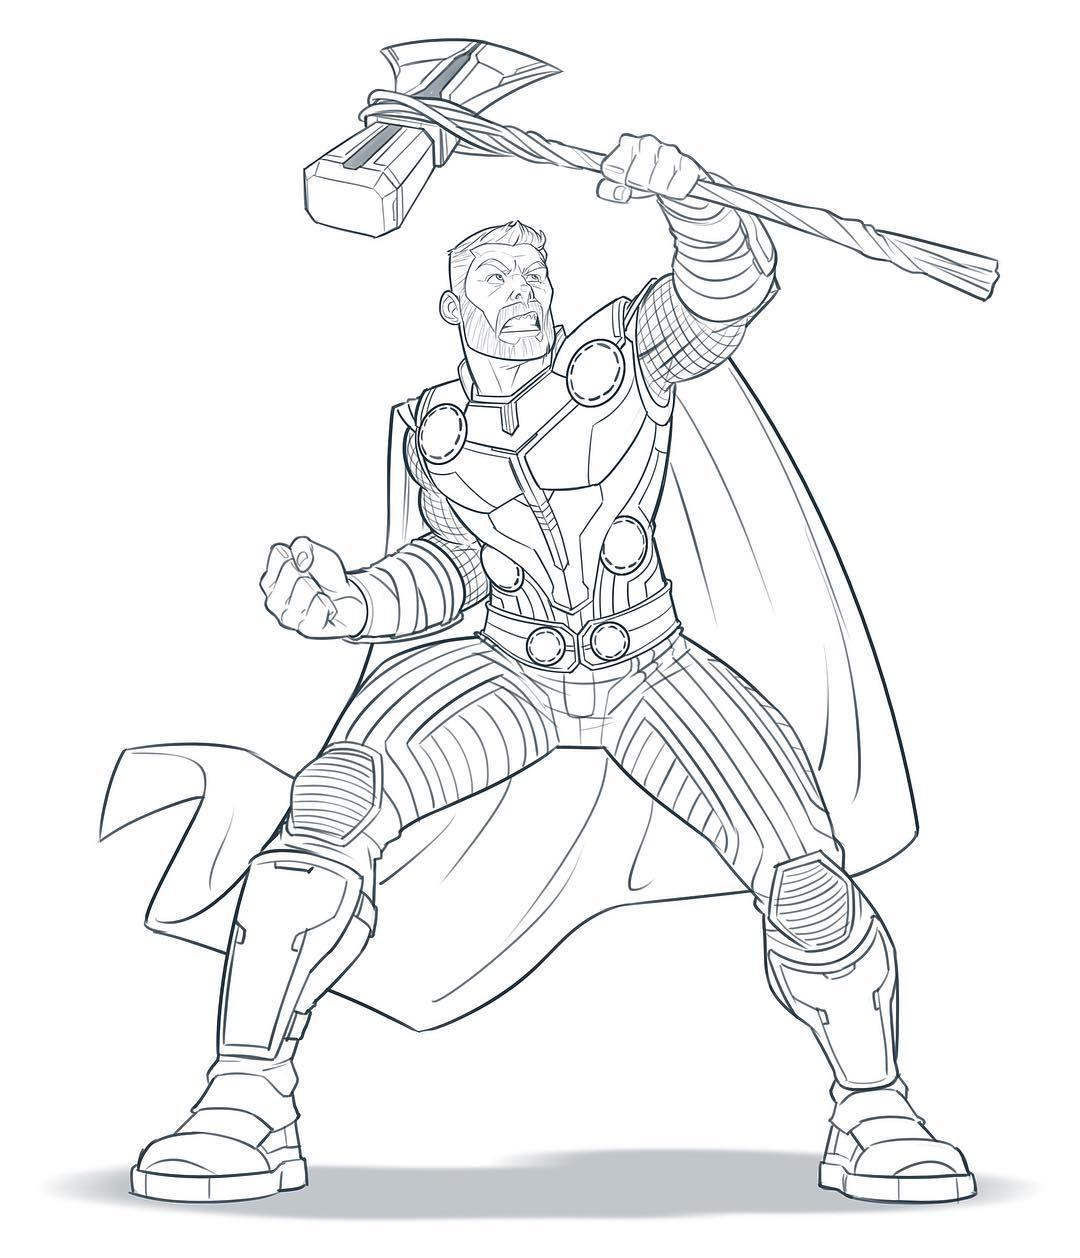 L Image Peut Contenir Dessin Marvel Coloring Thor Artwork Avengers Drawings